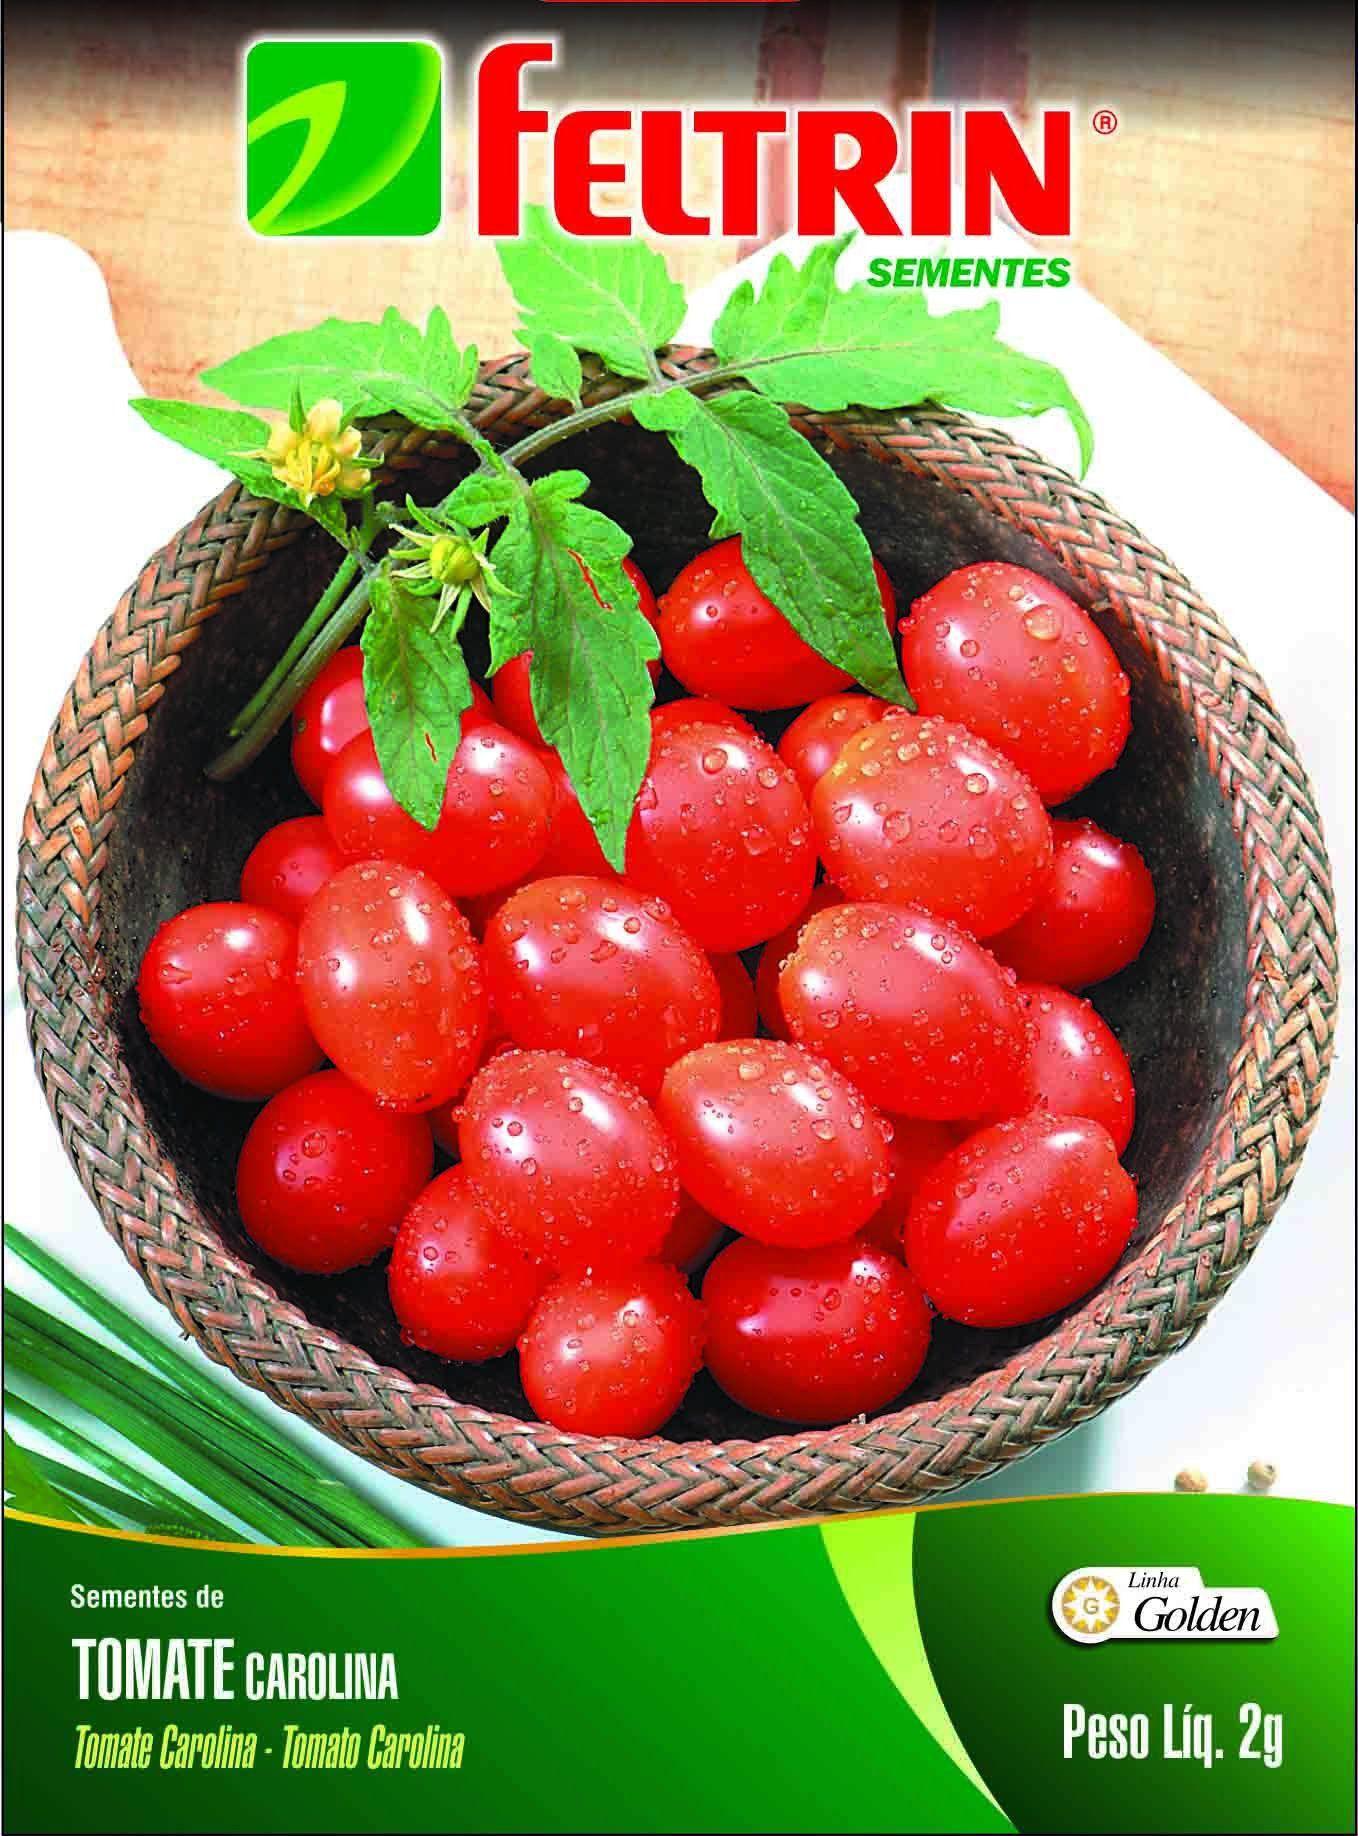 Sementes de Tomate Carolina - Feltrin Linha Golden